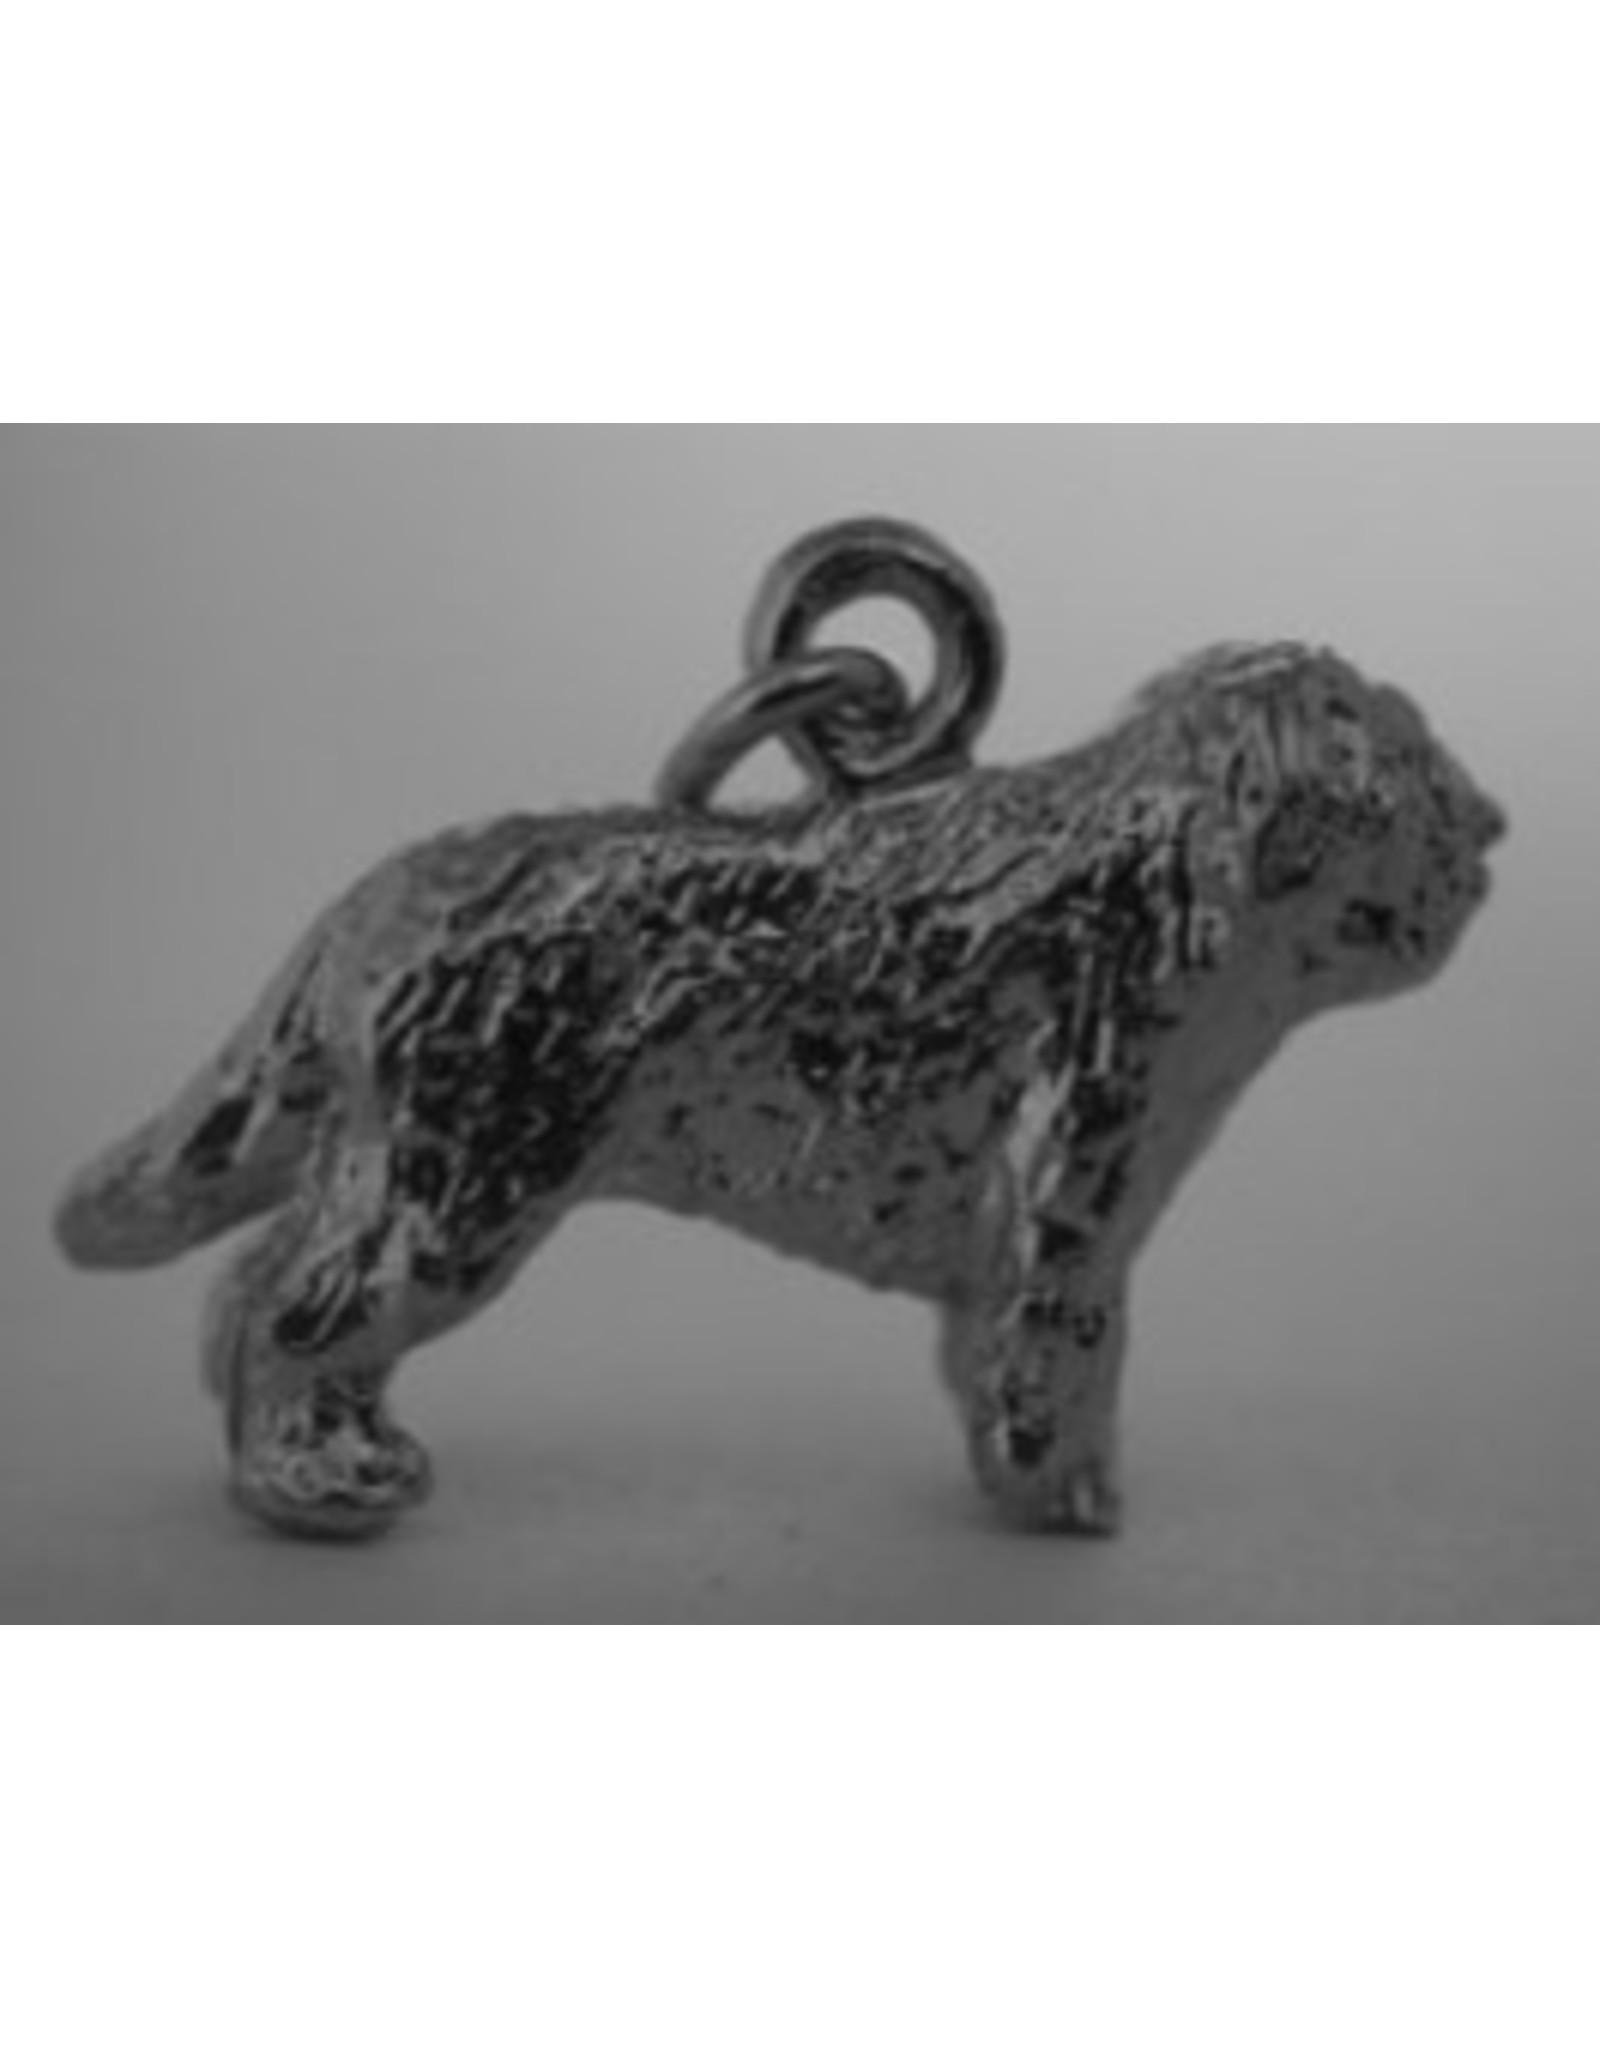 Handmade by Hanneke Weigel Sterling silver Nizziny owczarek Polish Lowland Sheepdog